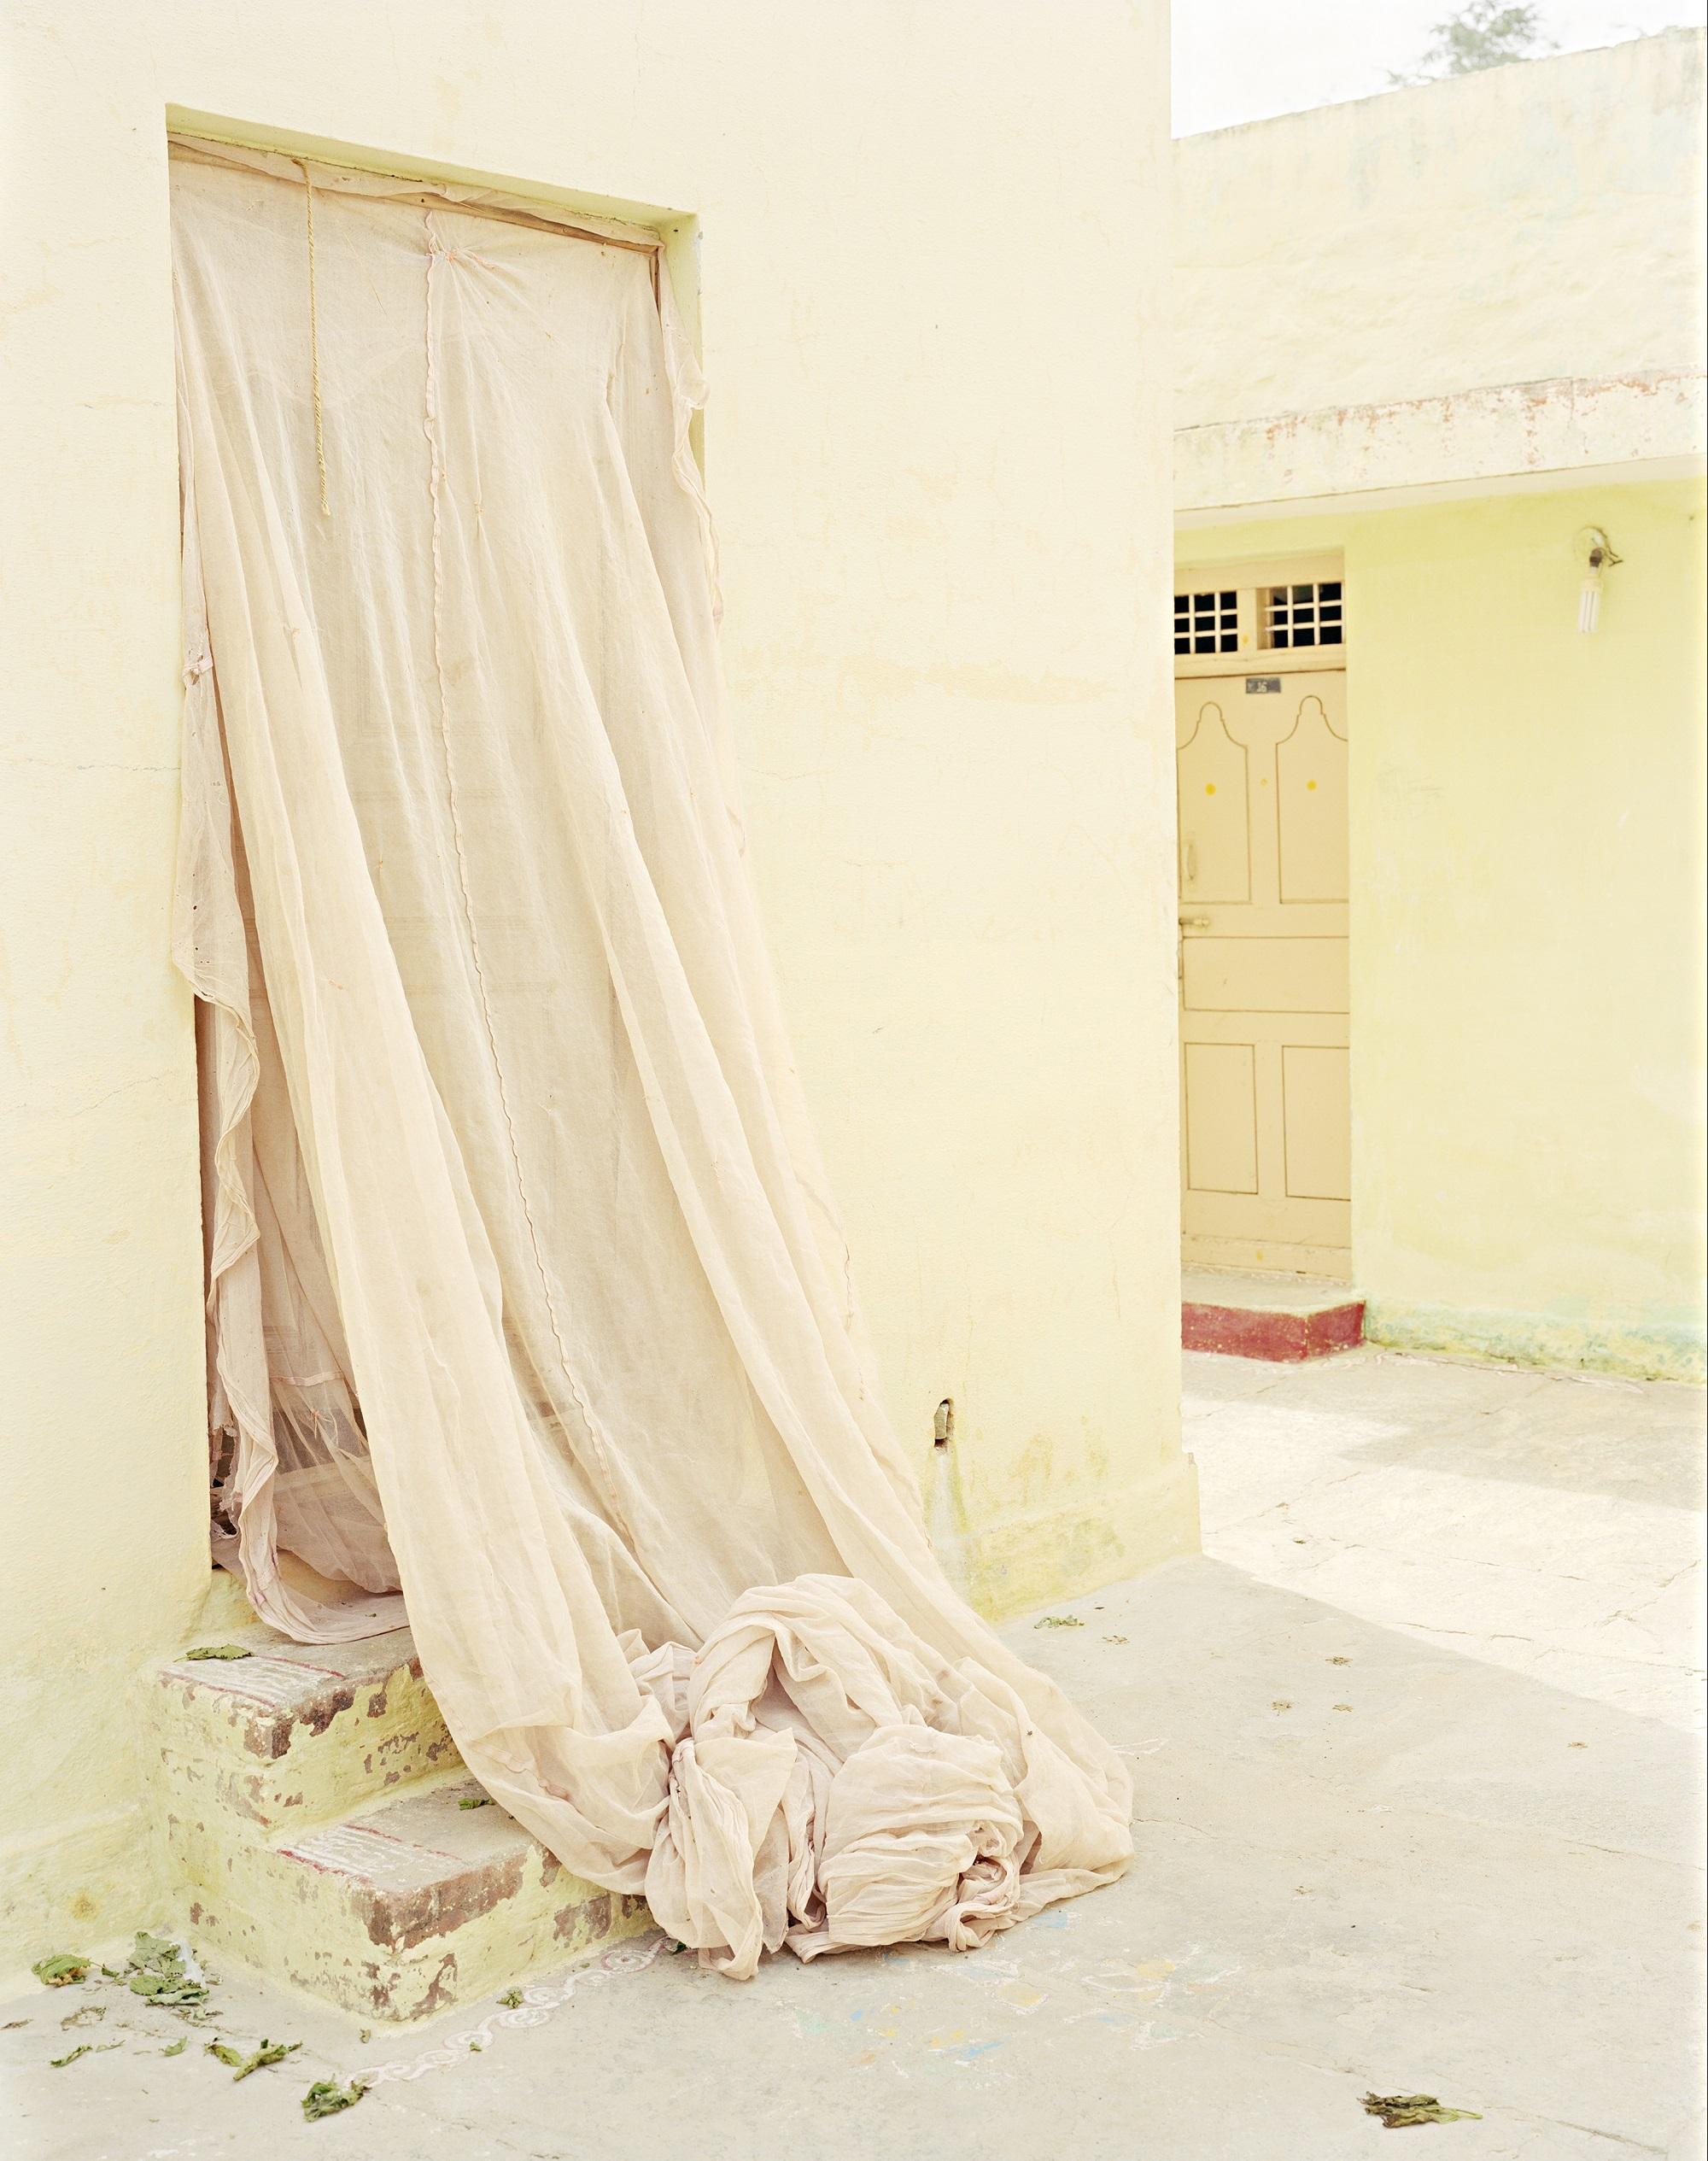 Secret Door, Avani, India, 2016 (C)Vasantha Yogananthan